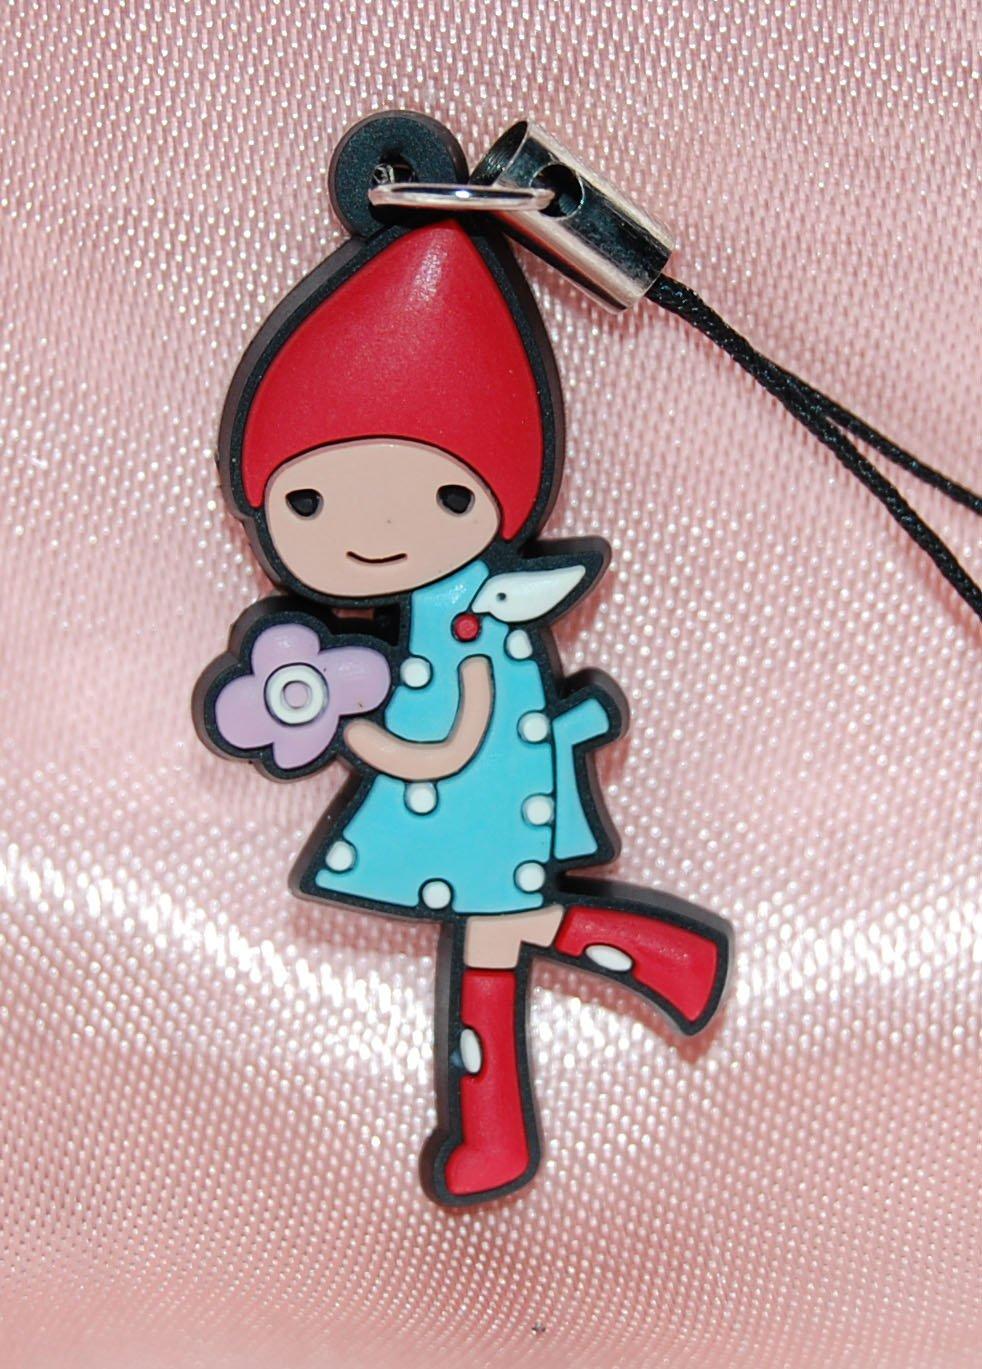 "Cute Girl Purple Flower Plastic Figure Strap Charm Mascot 1.25""H #5"